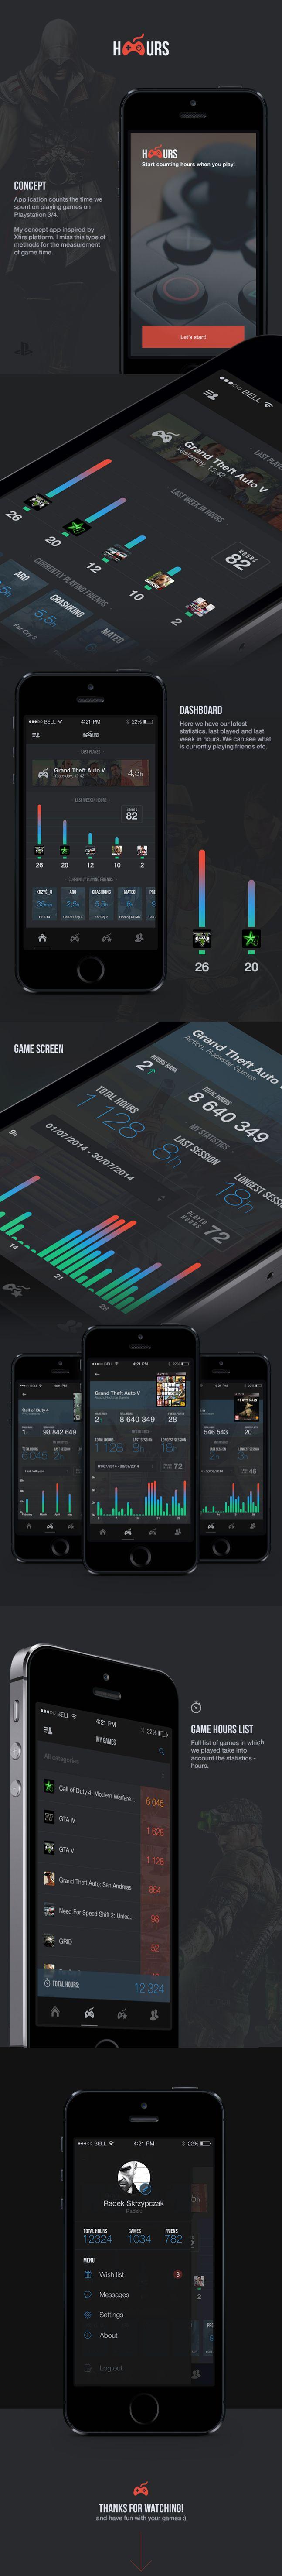 Hours Gaming    https://www.behance.net/gallery/19287377/HOURS-Gaming-app